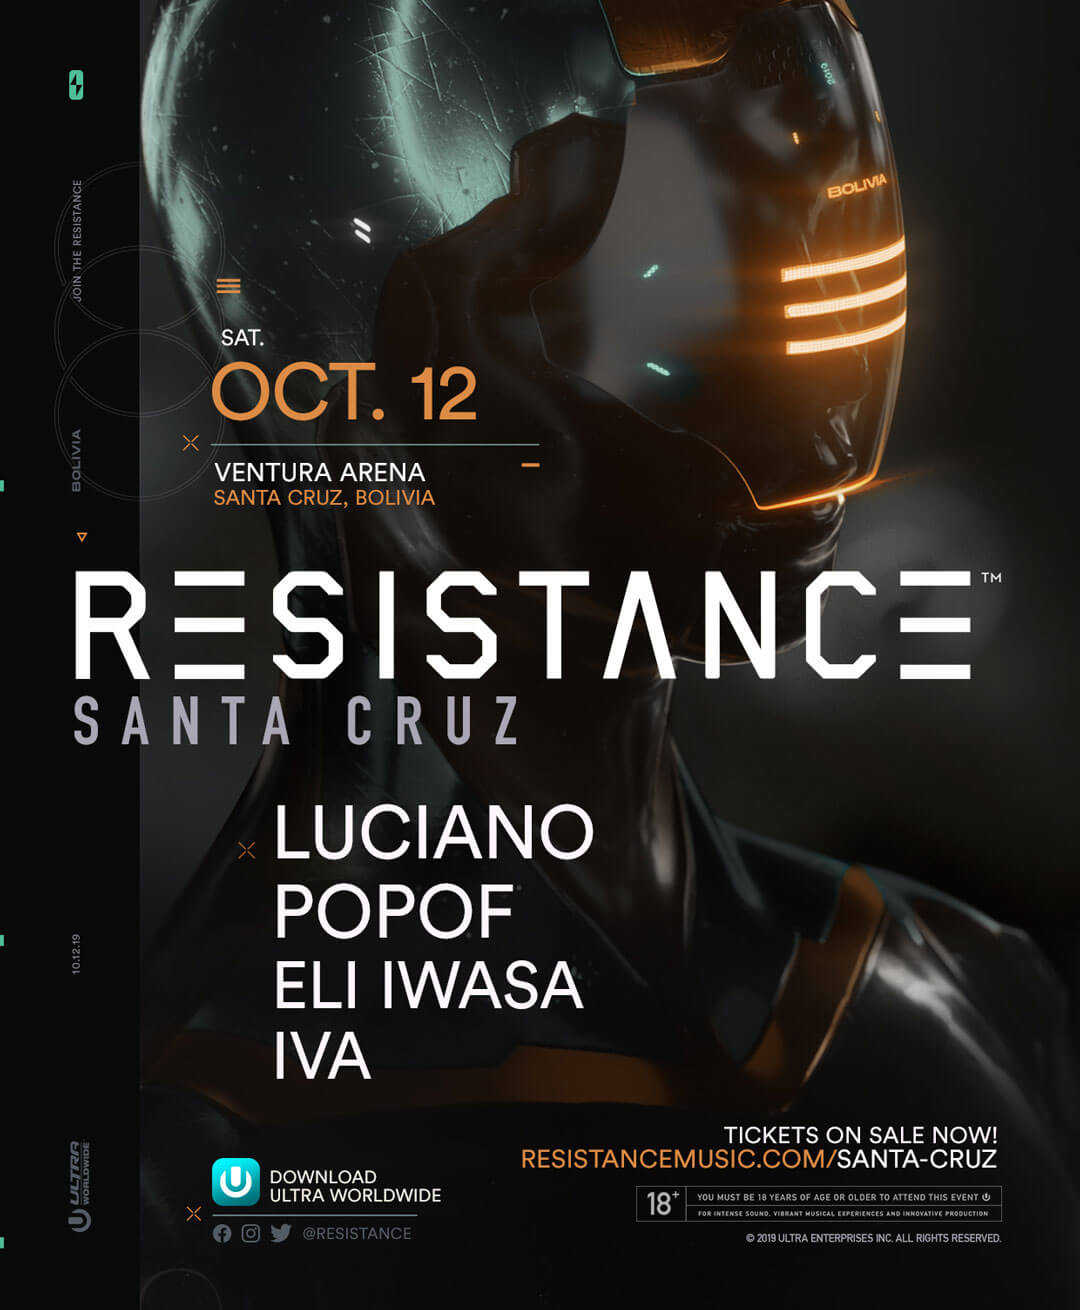 RESISTANCE Santa Cruz Releases Lineup